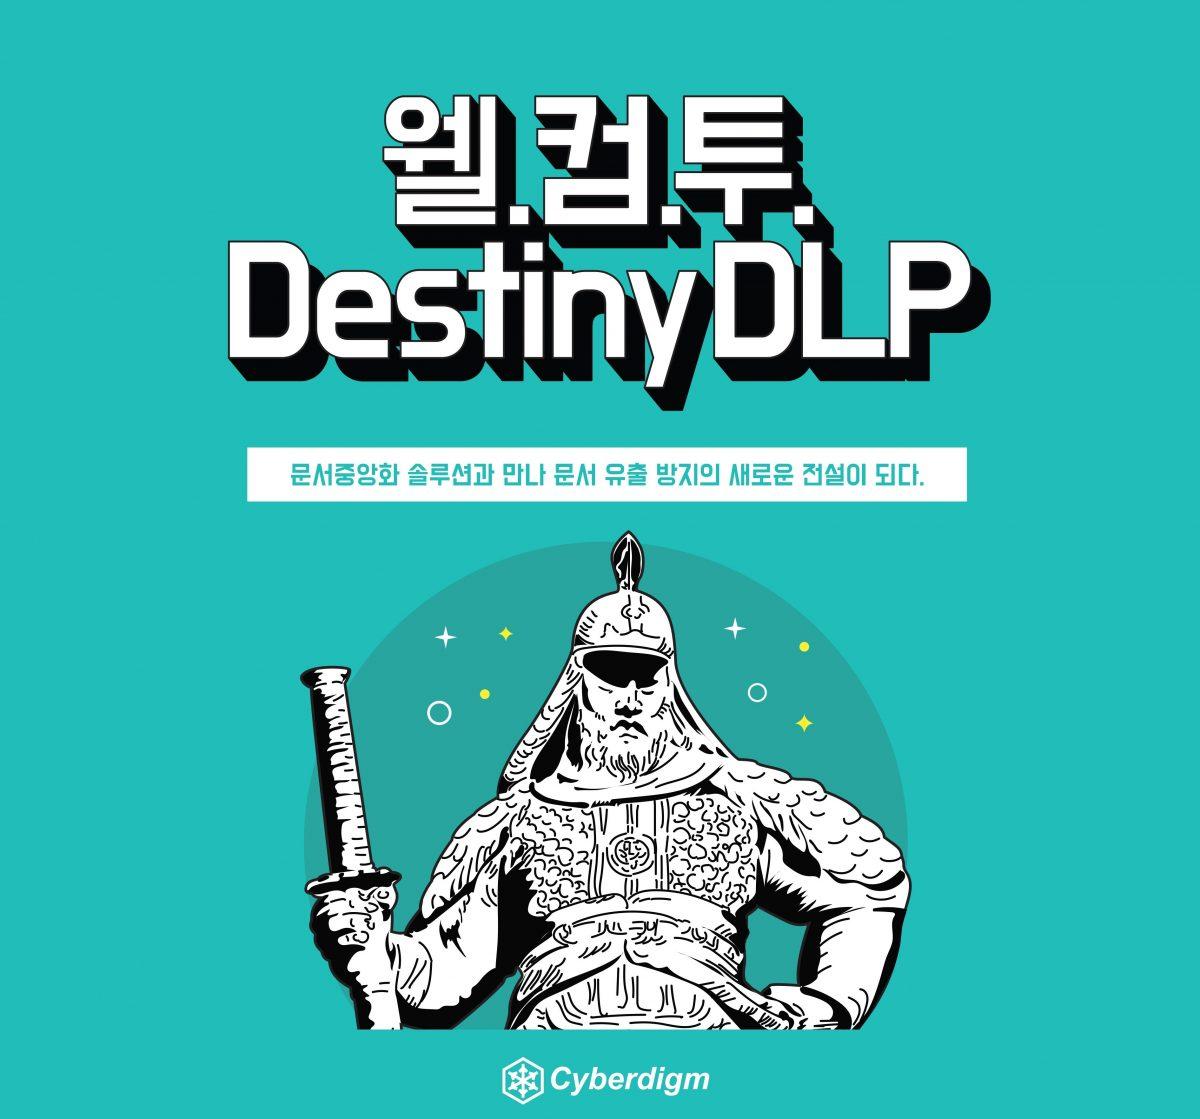 DestinyDLP.jpg